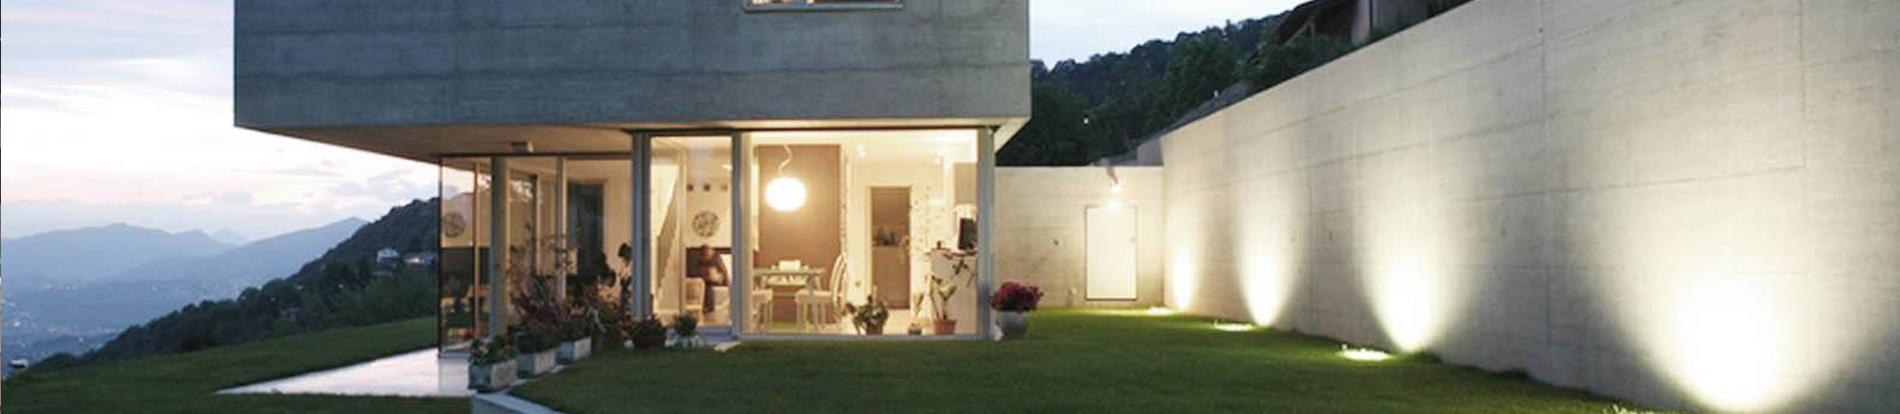 Illuminazione giardini - luci da giardino - Verdeblu Giardini - Pavia